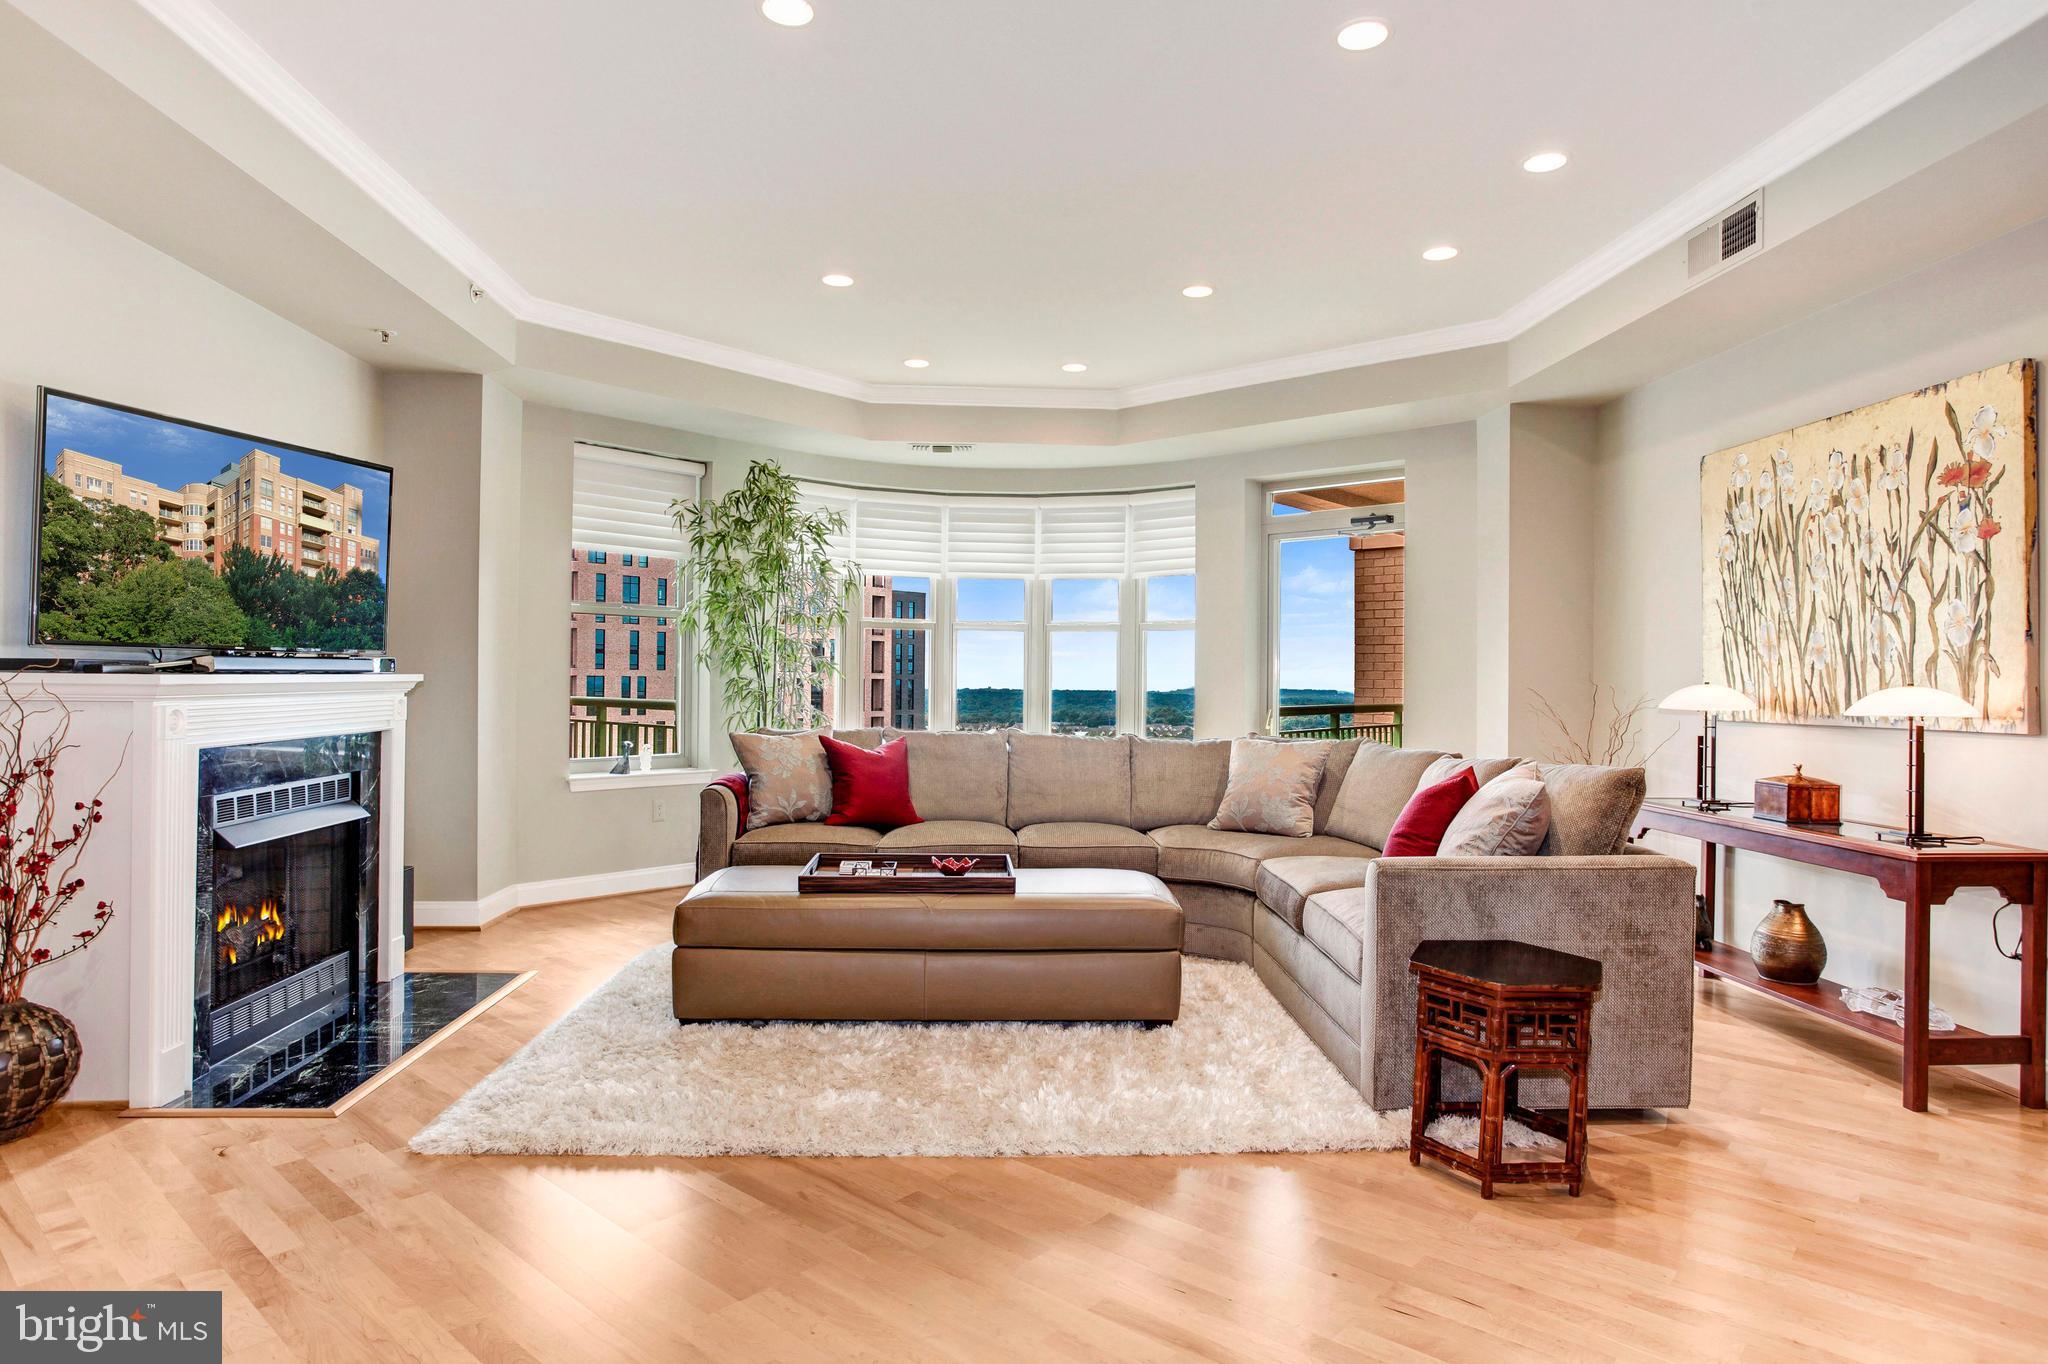 11776 STRATFORD HOUSE PLACE 1408, RESTON, VA 20190